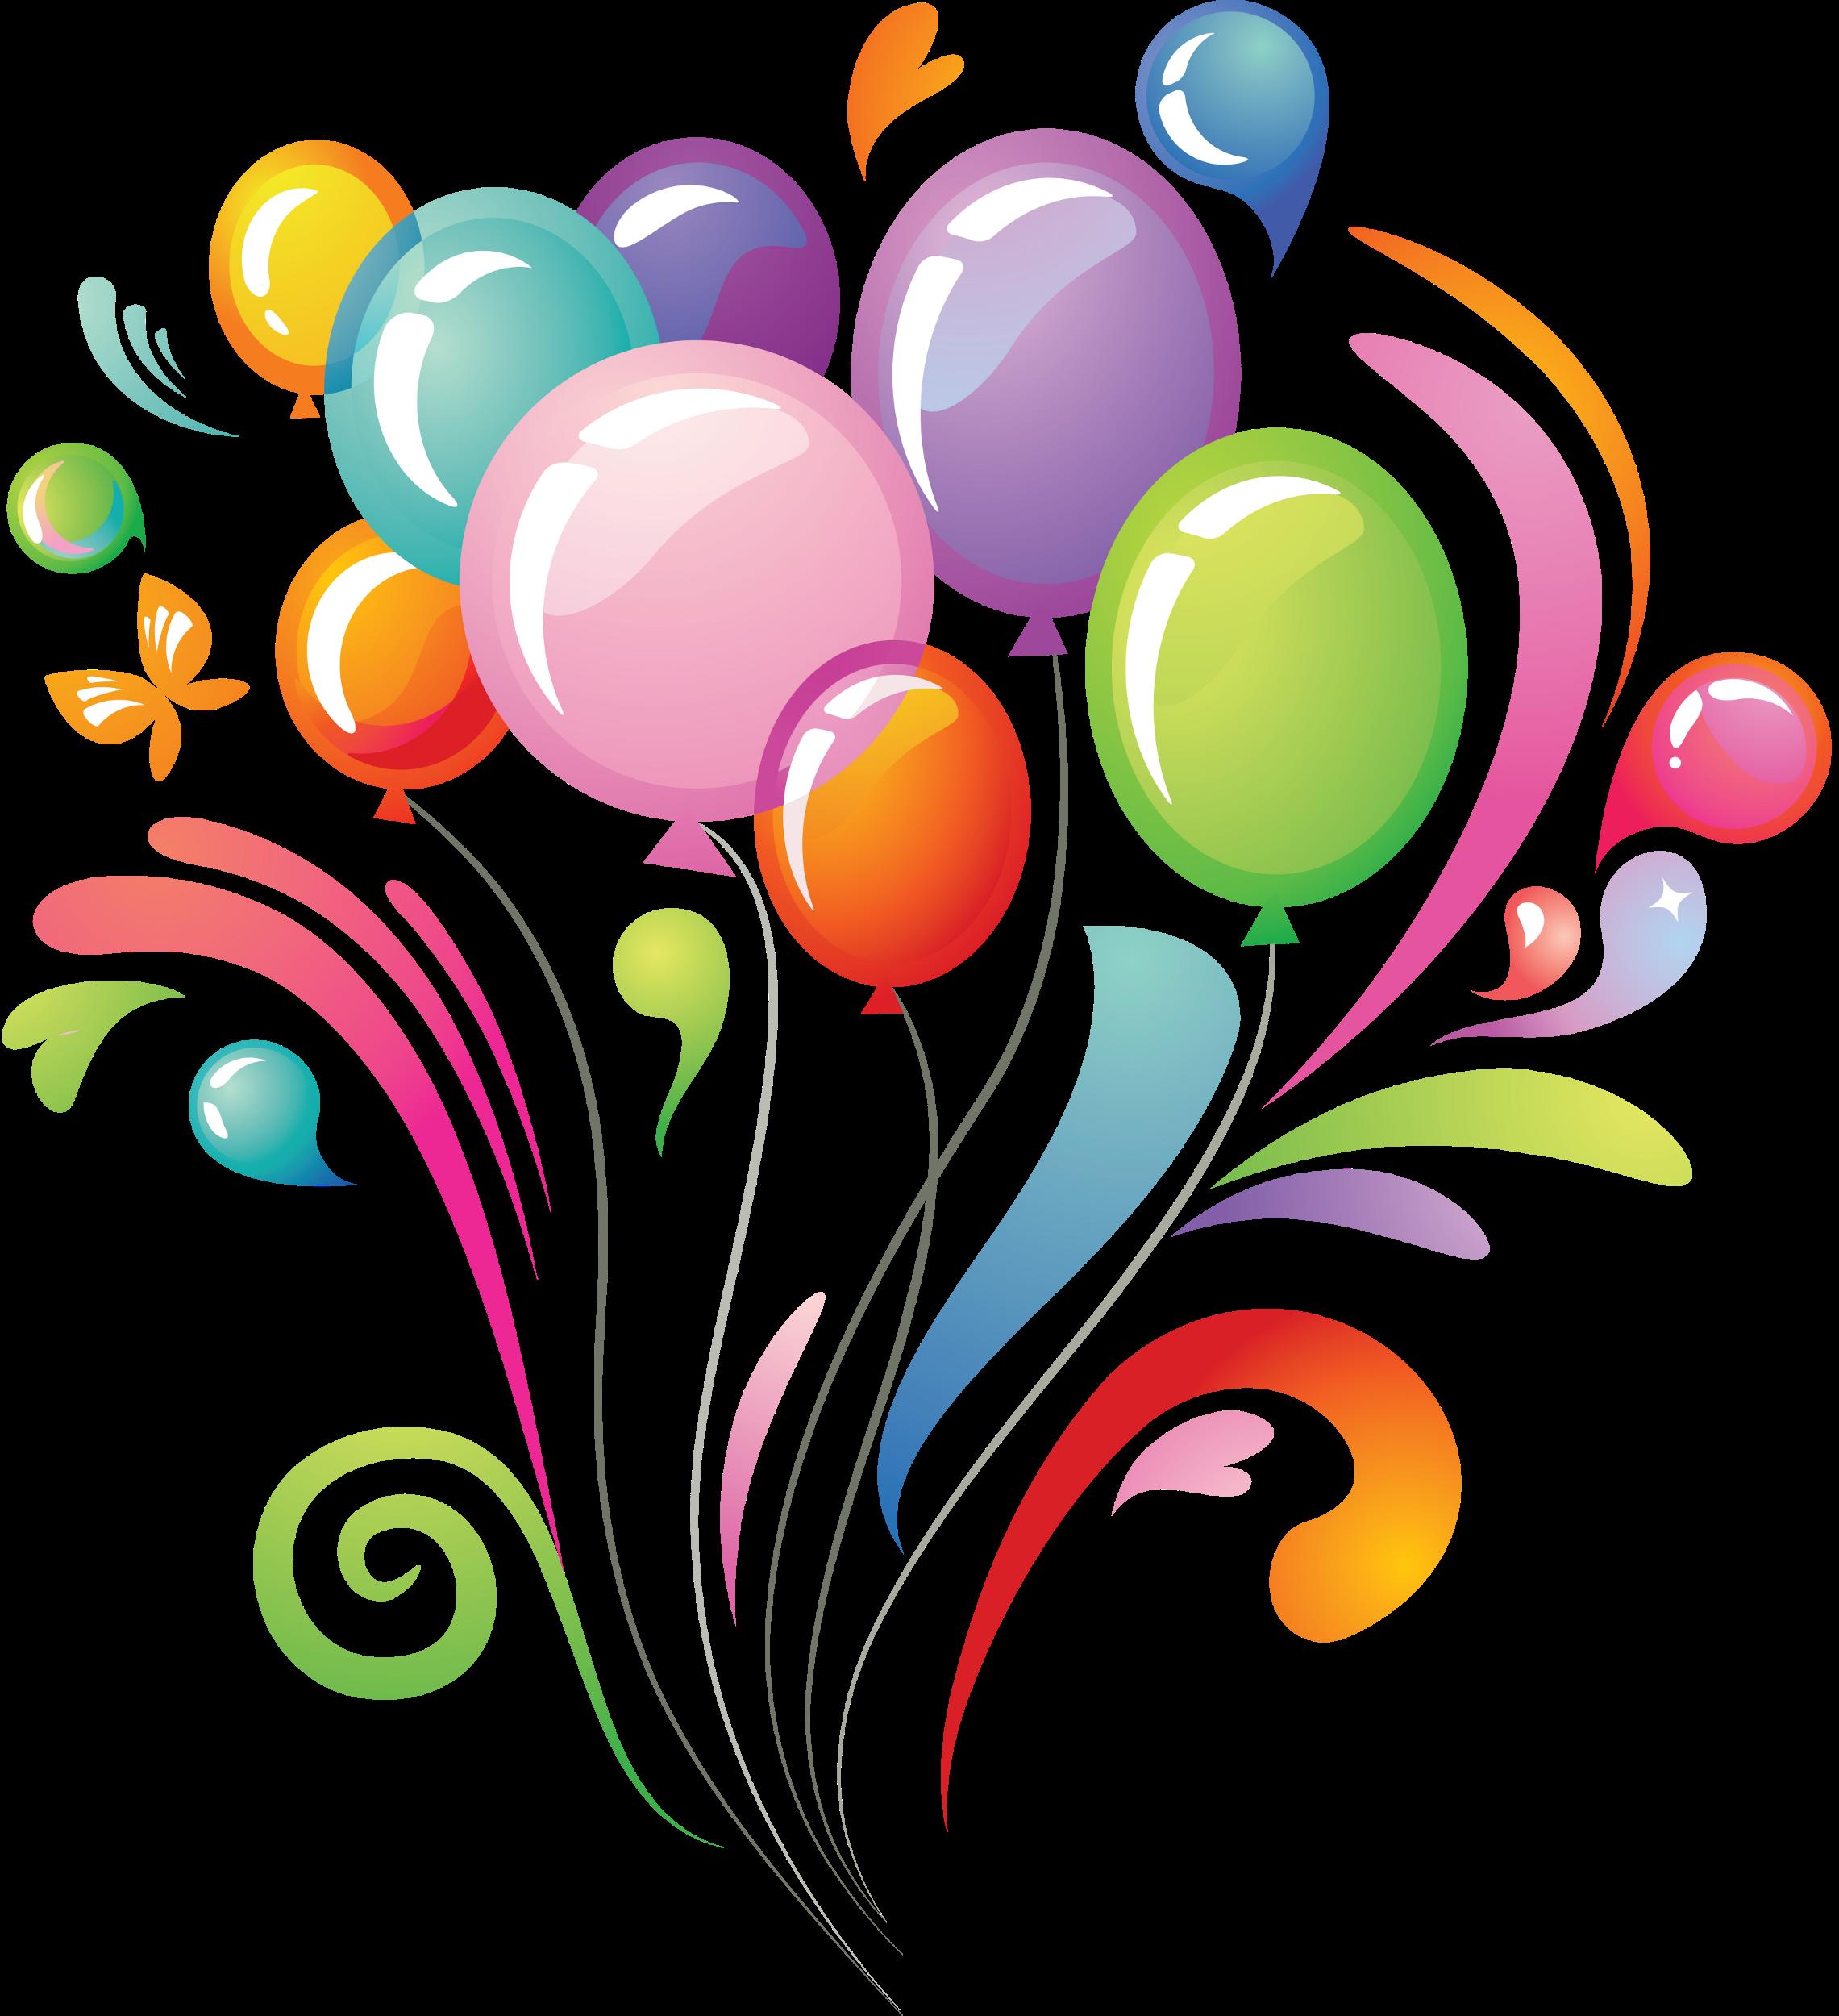 Fasching Helau Narri Narro Karneval Fasching Party Birthday